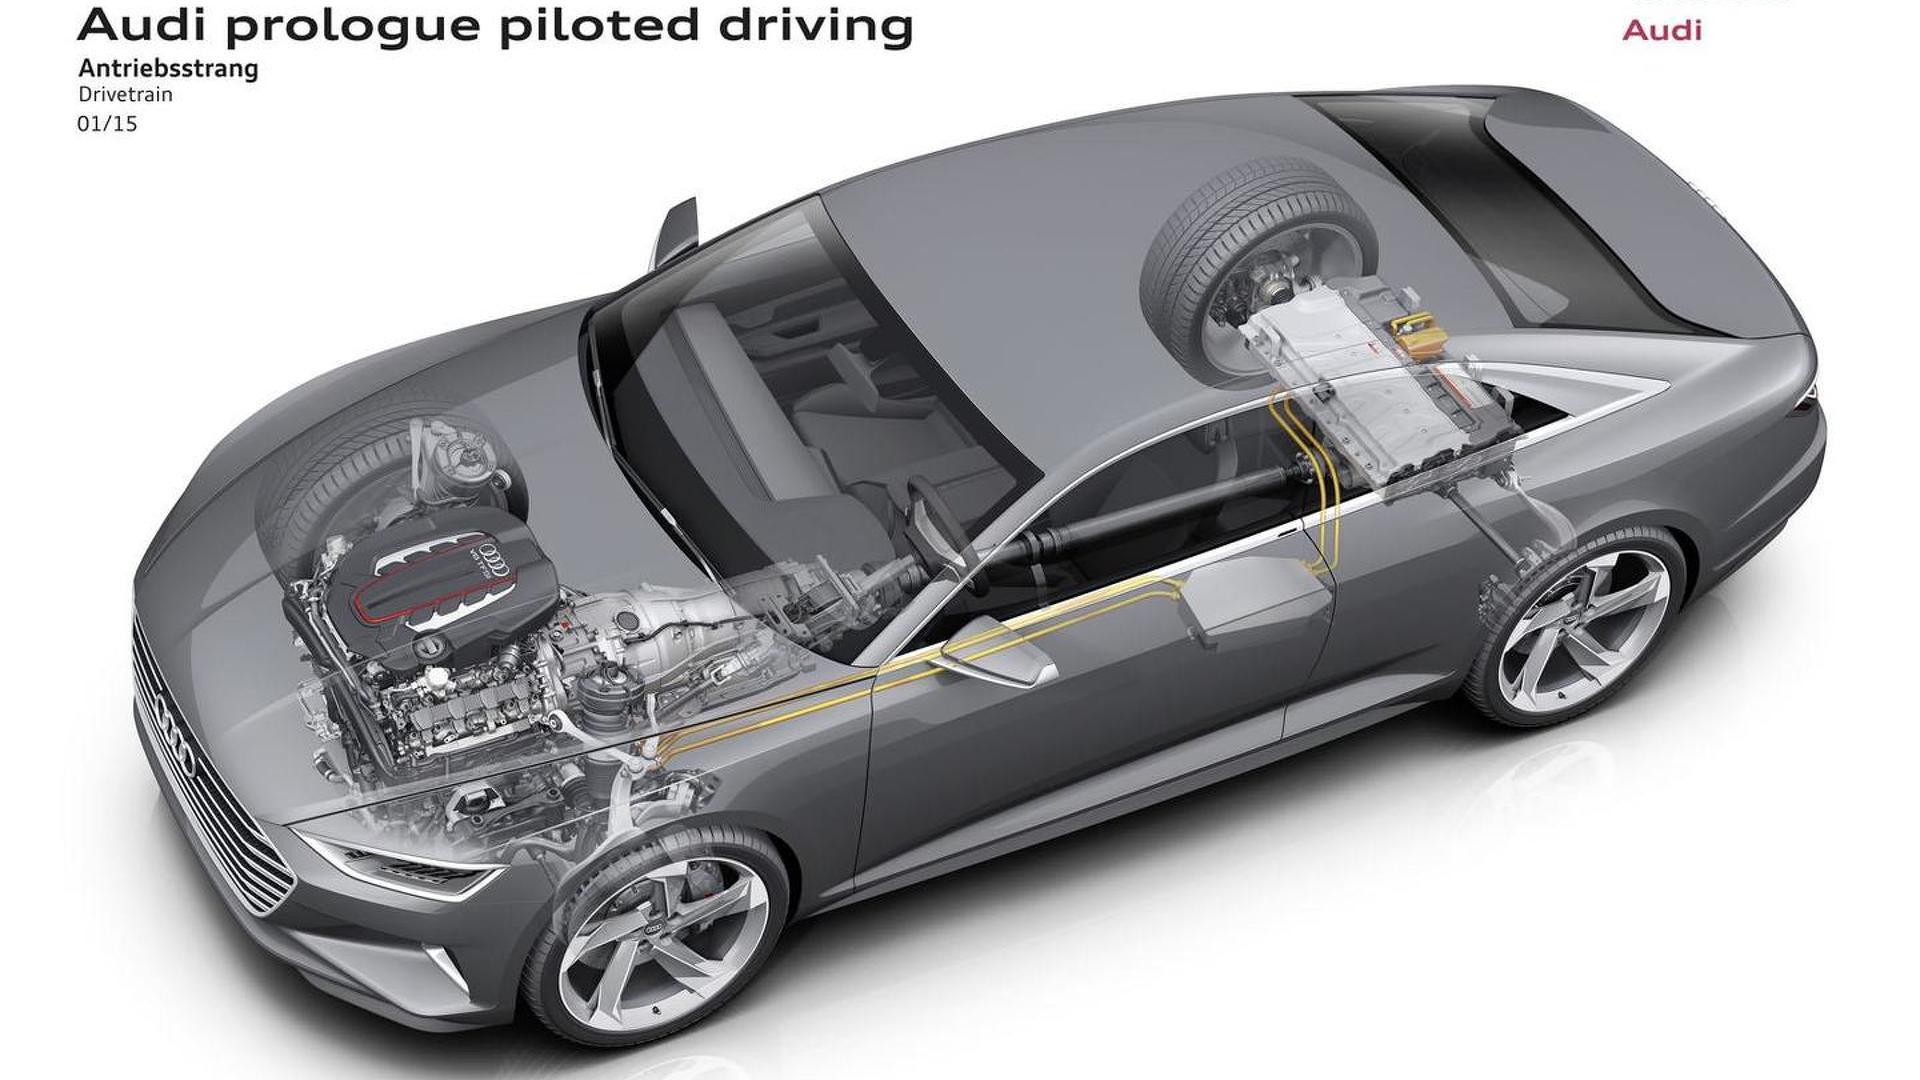 Шасси Мультируль Audi Prologue Piloted Driving